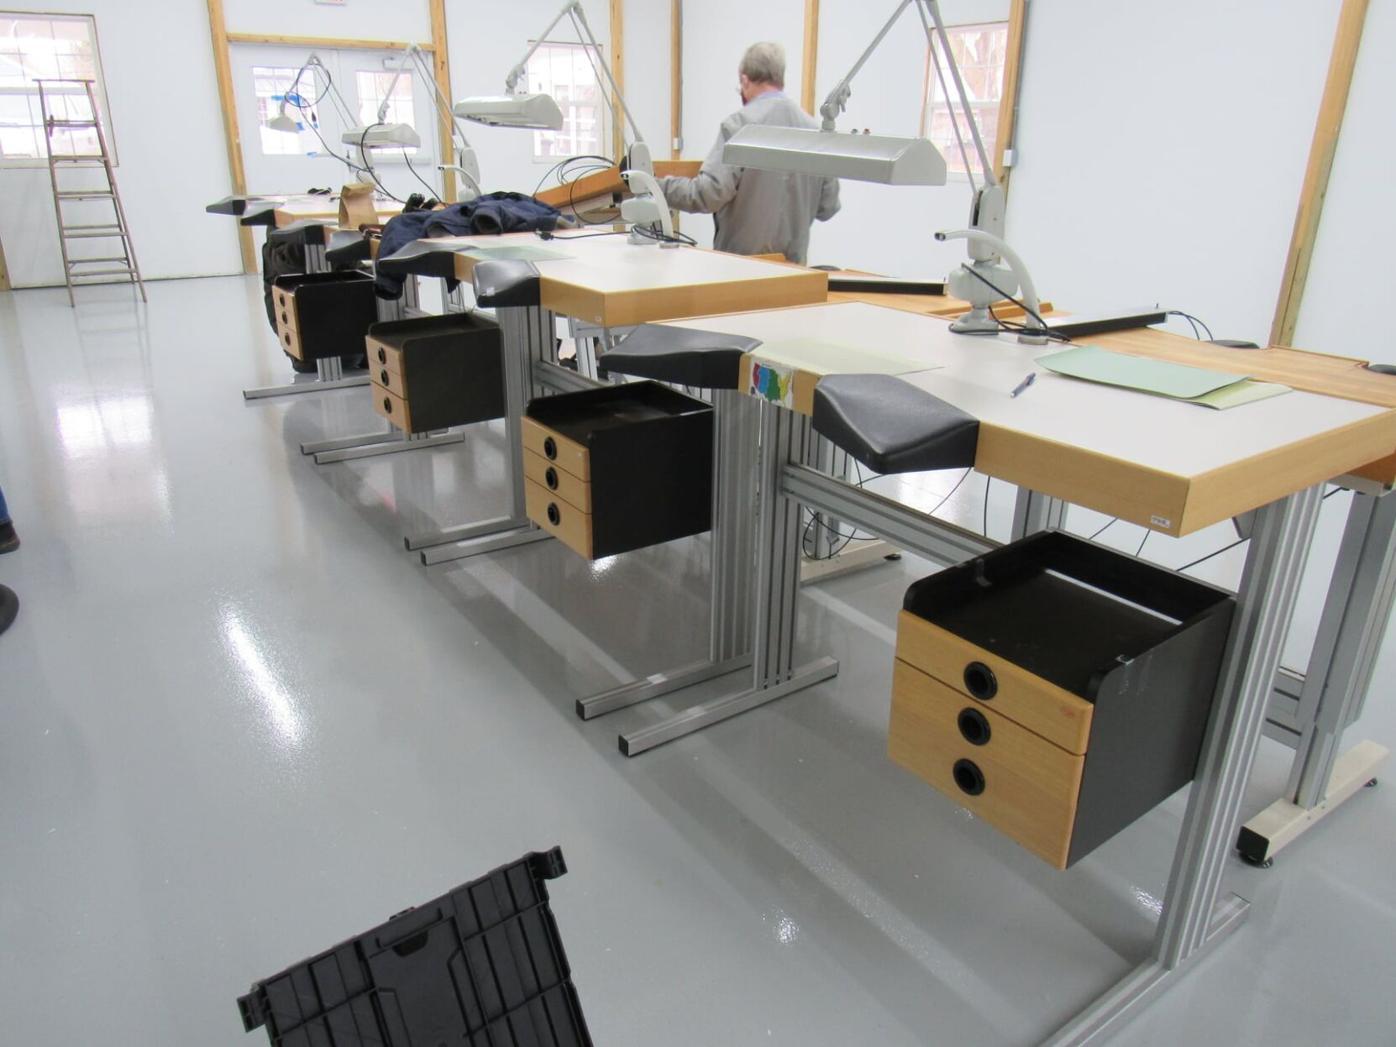 VWI student service center